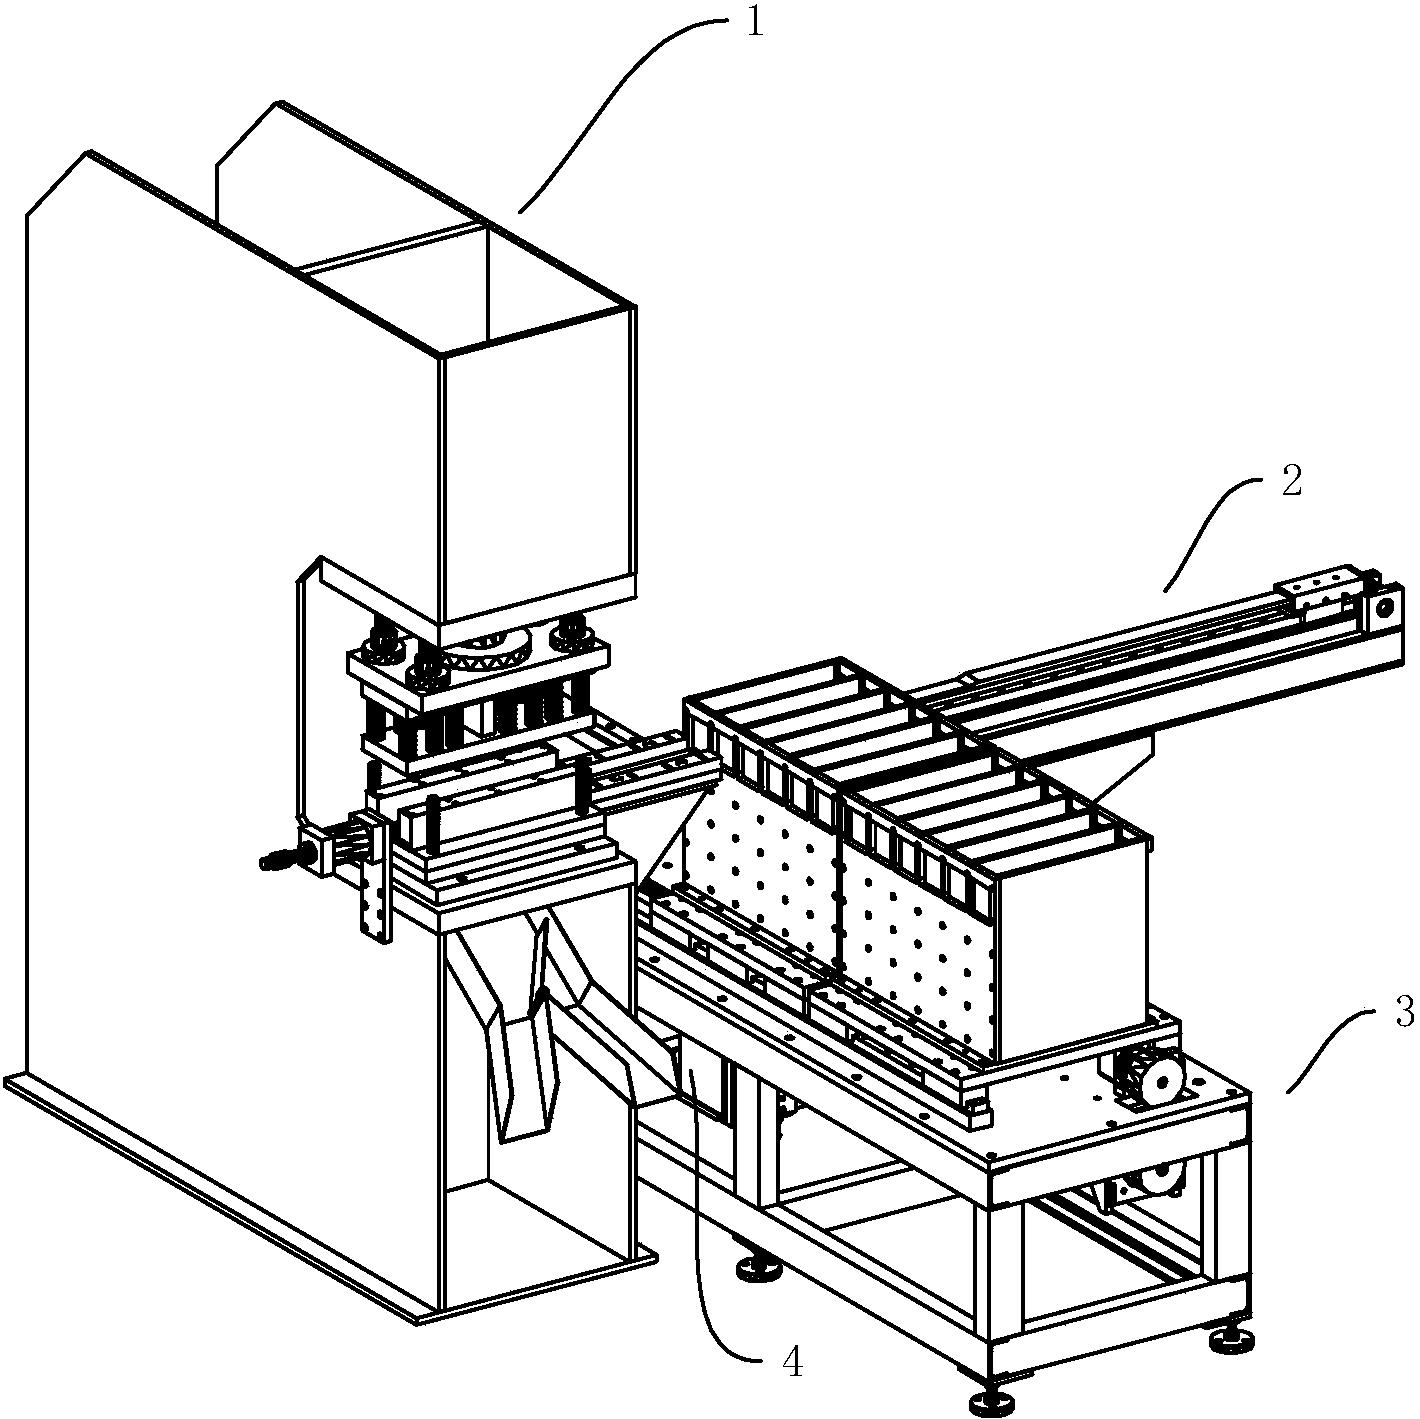 cn106077226b_一种软金属切割生产线有效